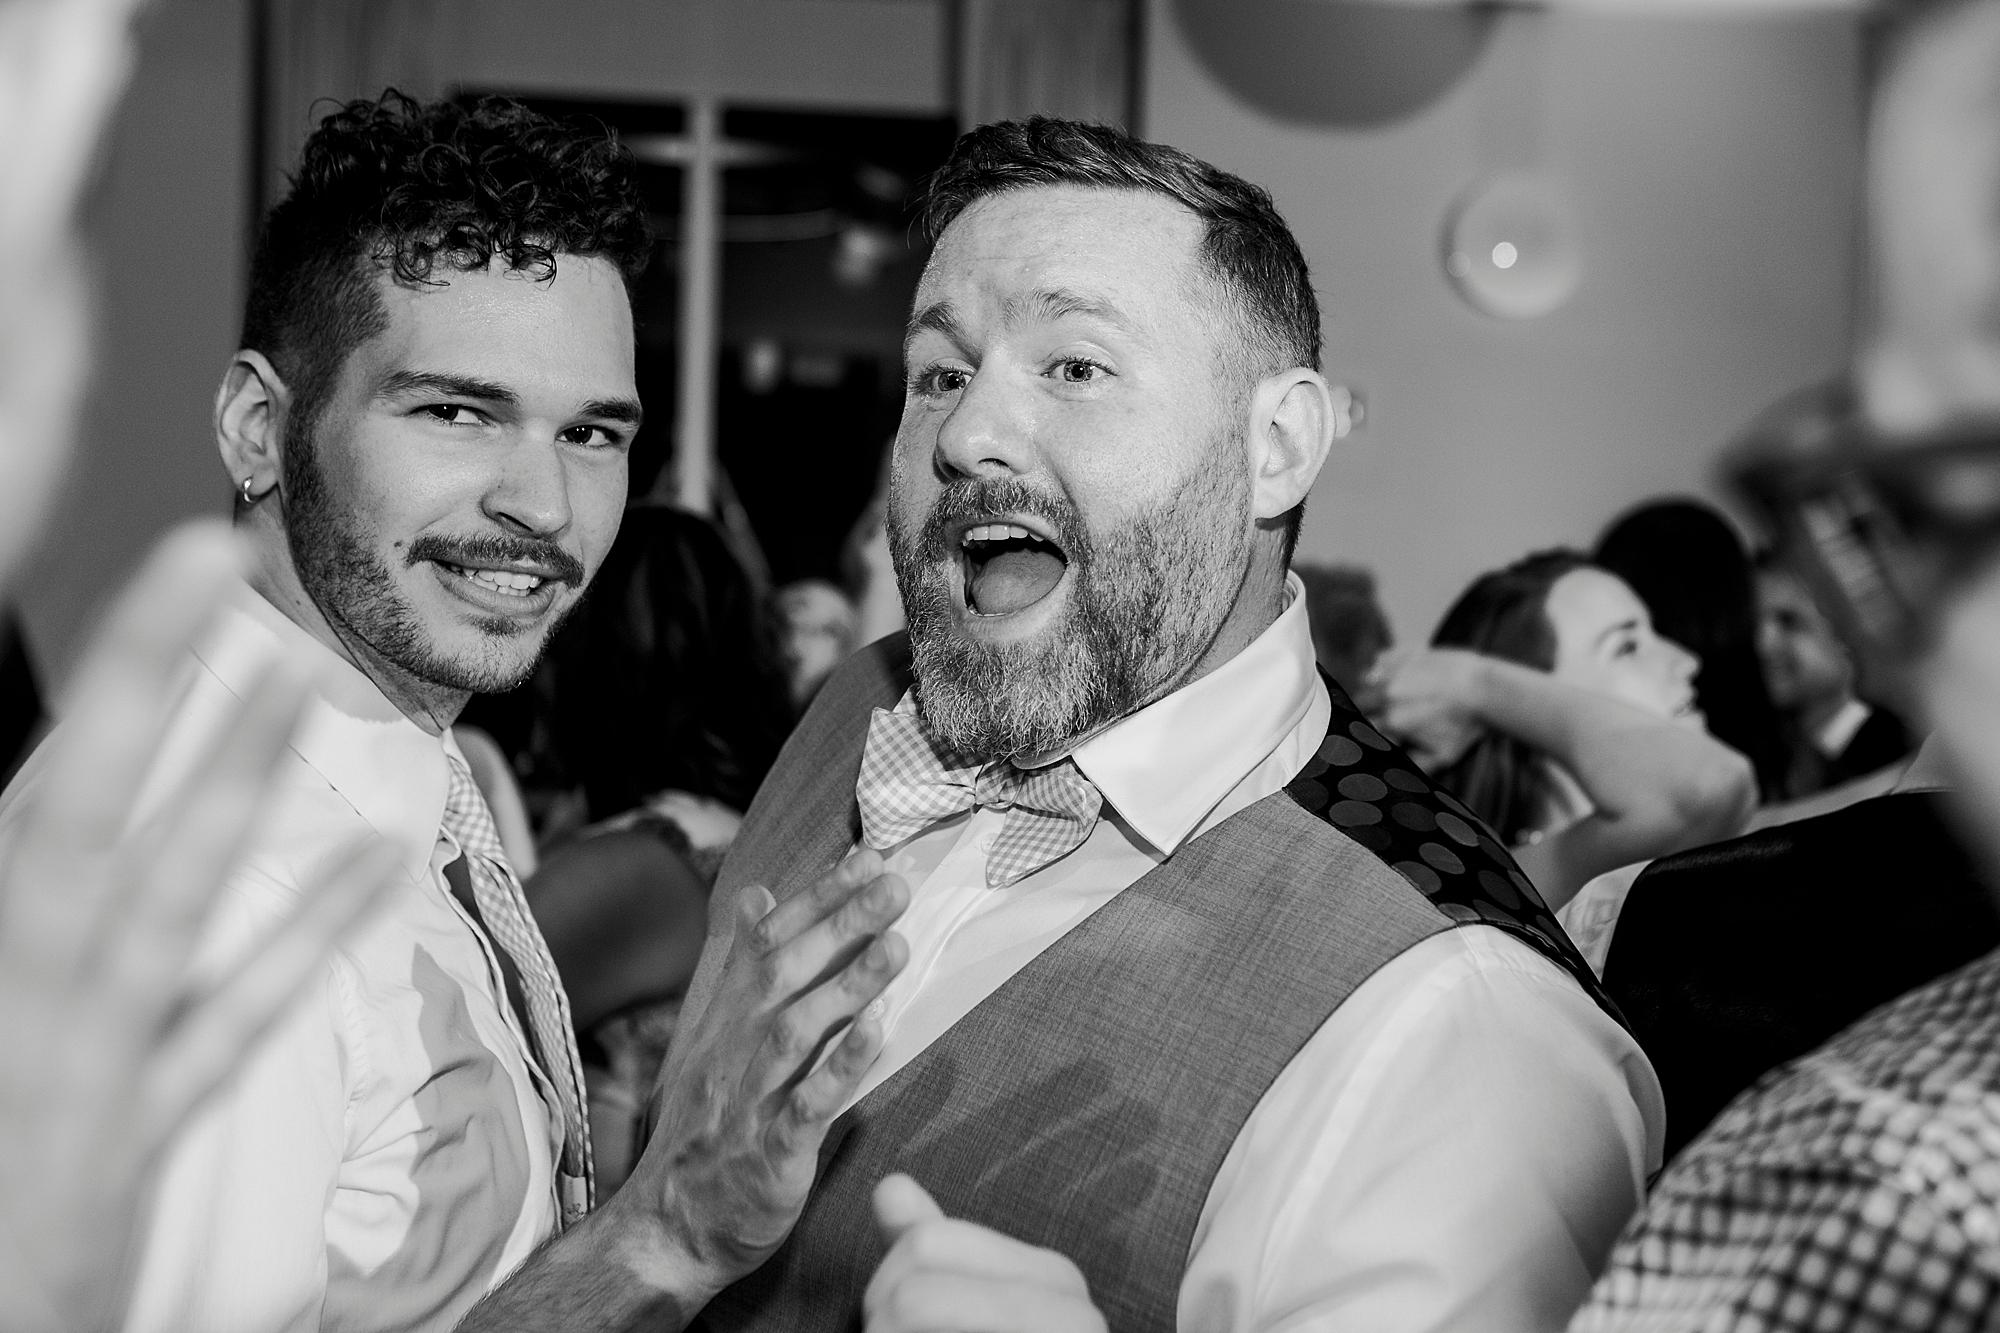 Dan_and_Byron_Love_by_Joe_Mac_Philadelphia_Wedding_LGBTQ_Photography_Gay_Independence_visitor_Center_138.JPG